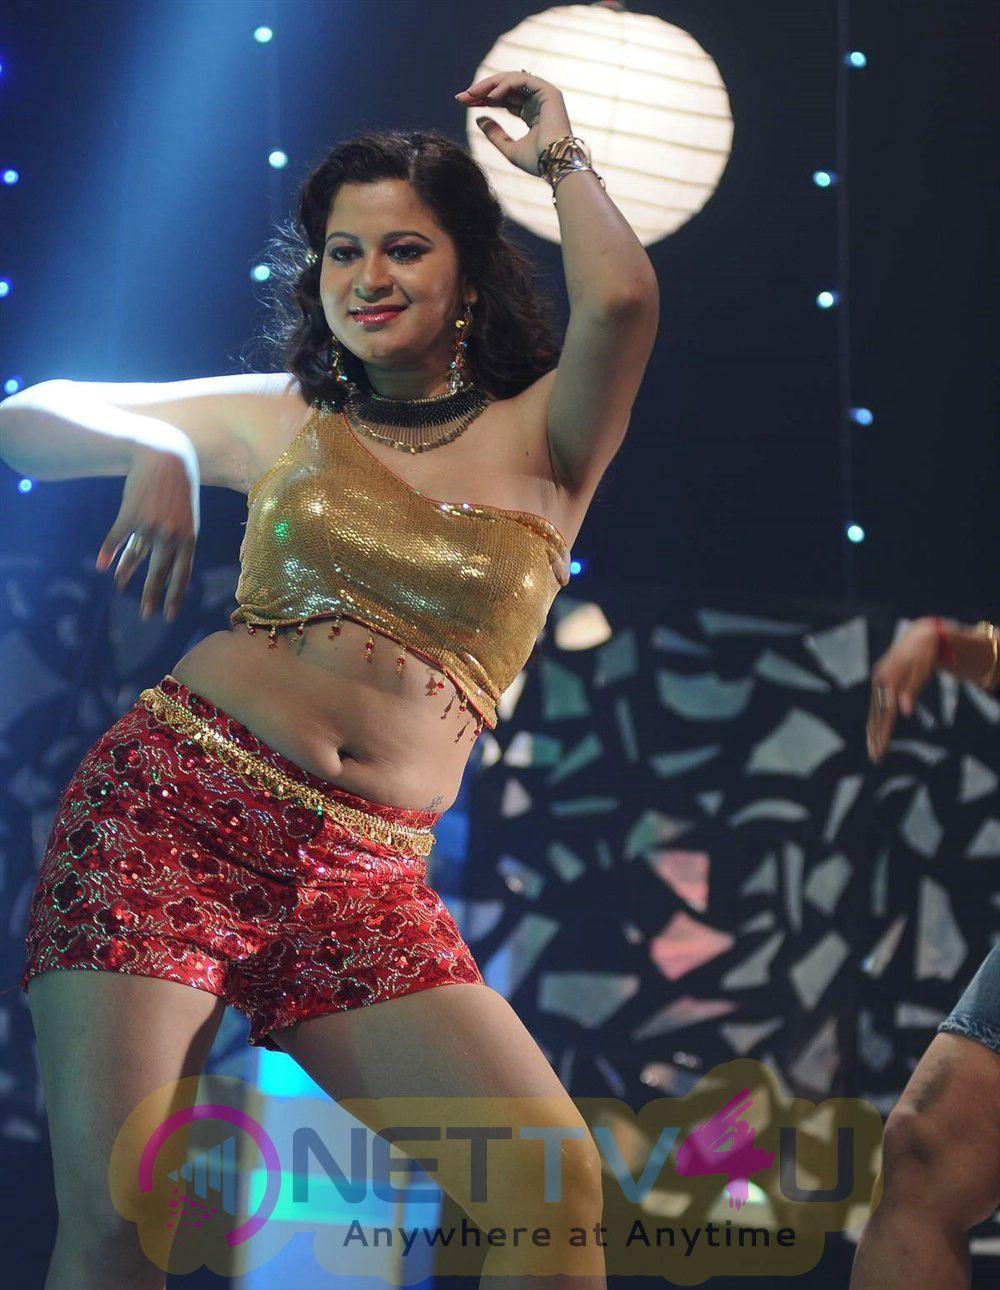 from Braylon tamil girl hot pxxx hotos